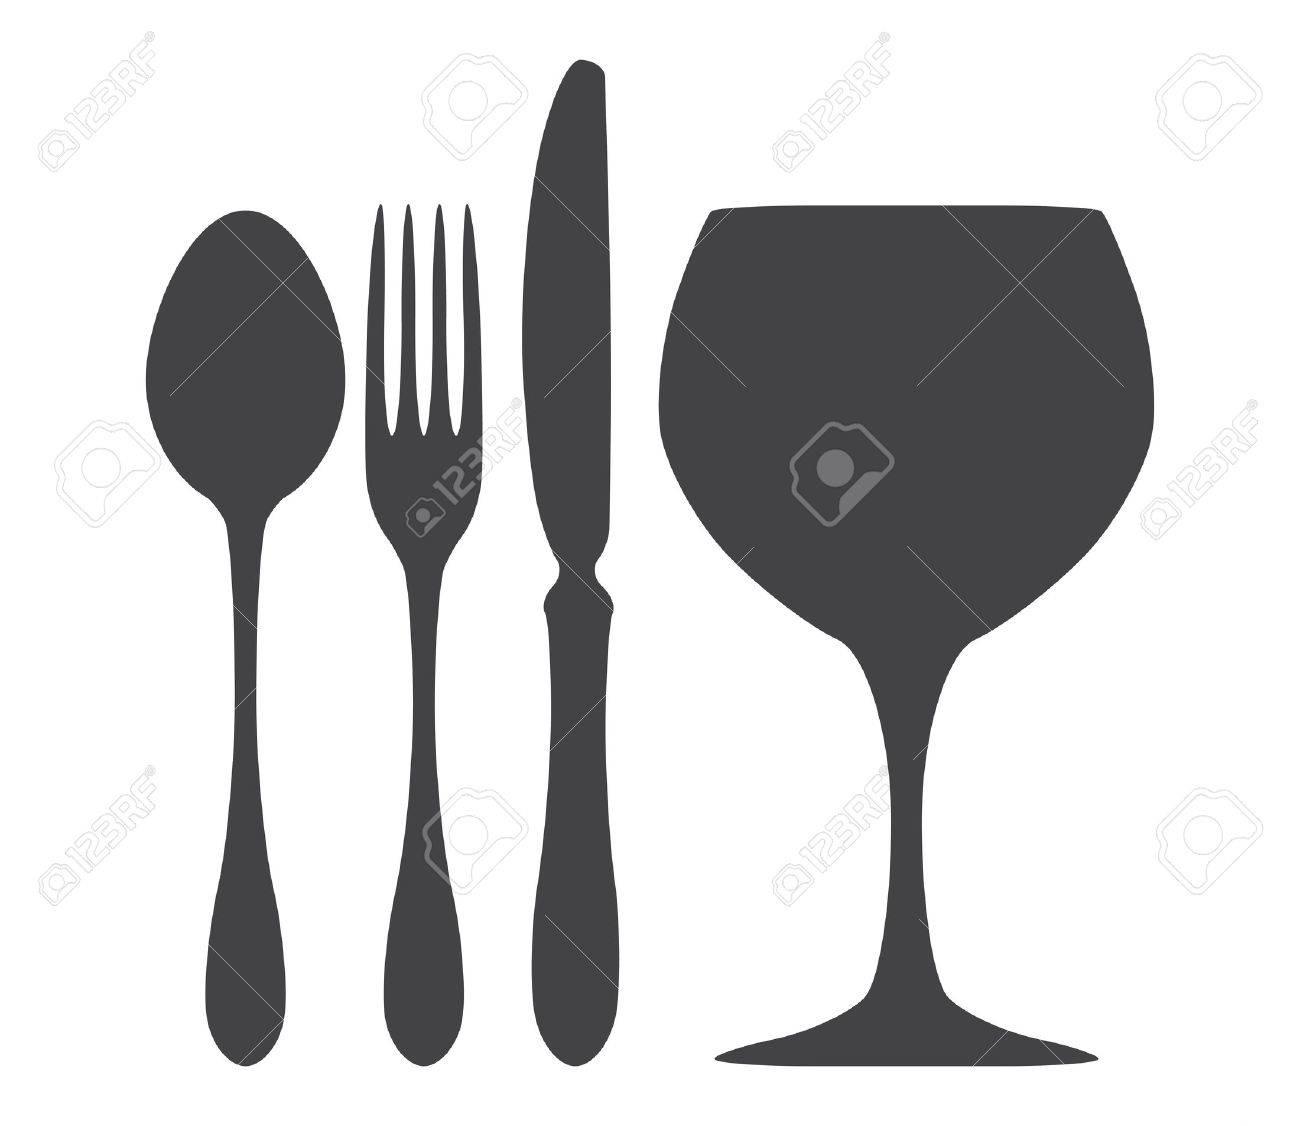 Cutlery spoon knife fork glass illustration Stock Vector - 17187281